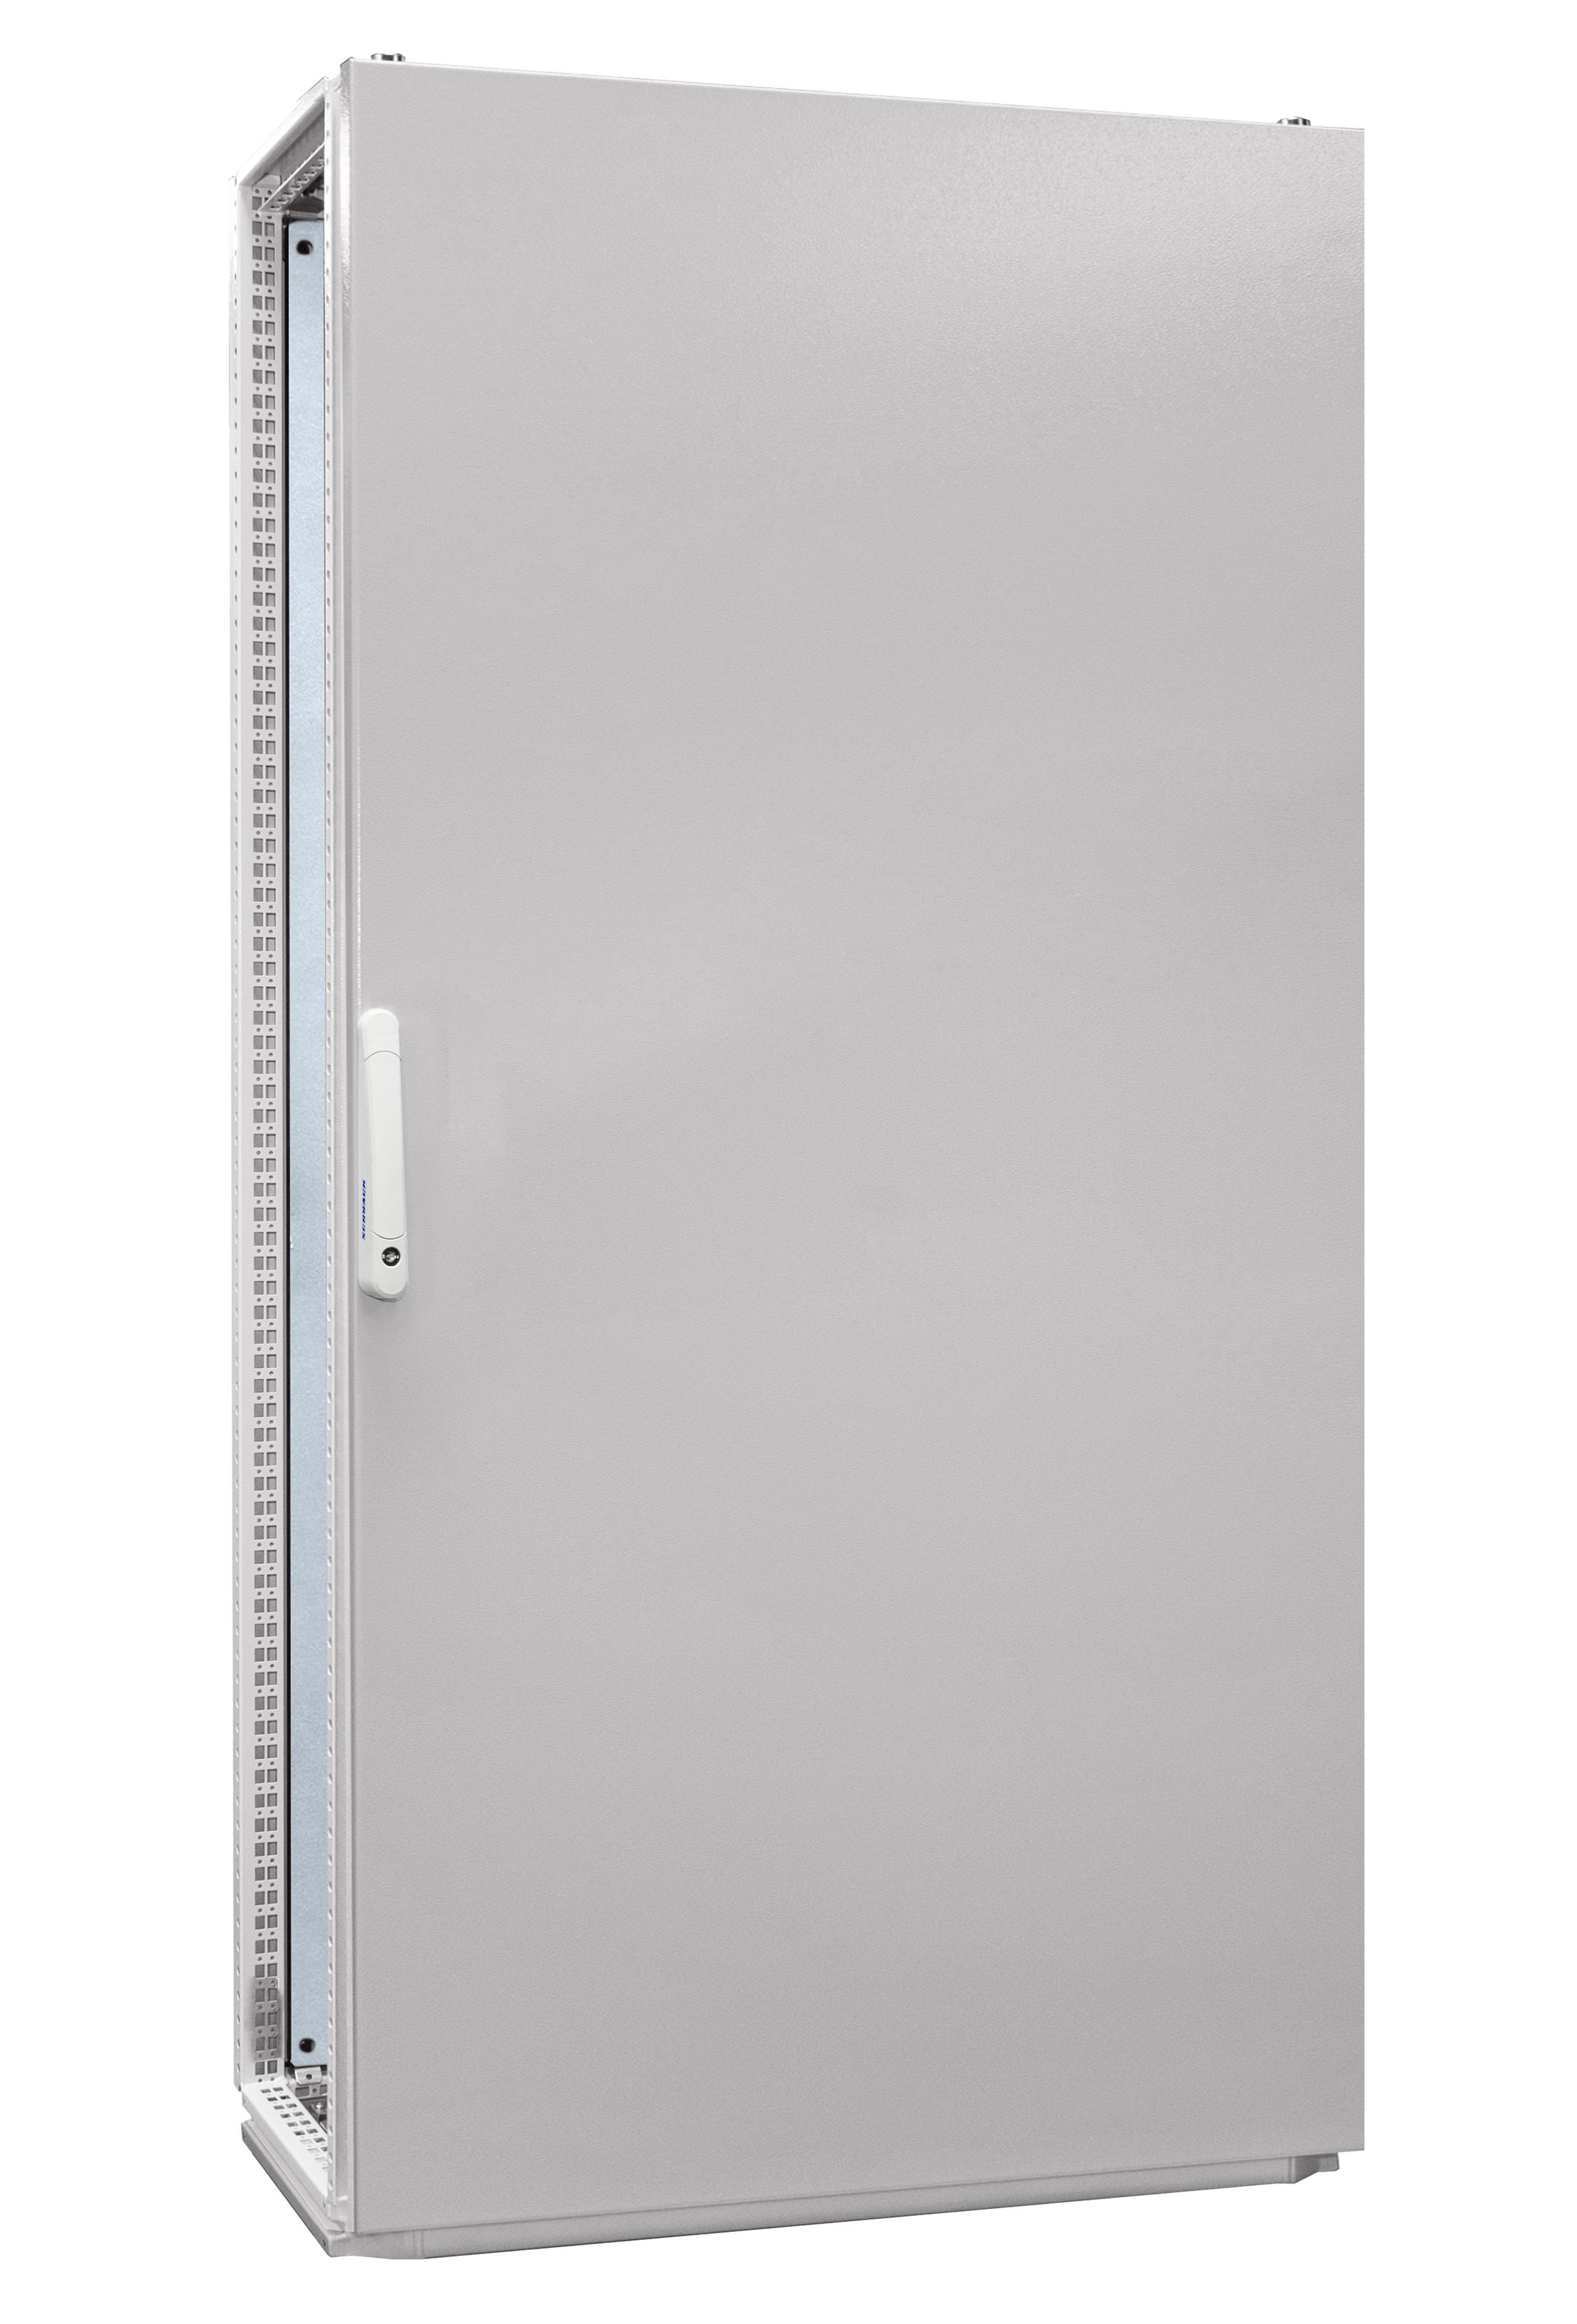 1 Stk Anreihschrank 1-Tür IP55 H=2000 B=1000 T=400mm Stahlblech AC201040--